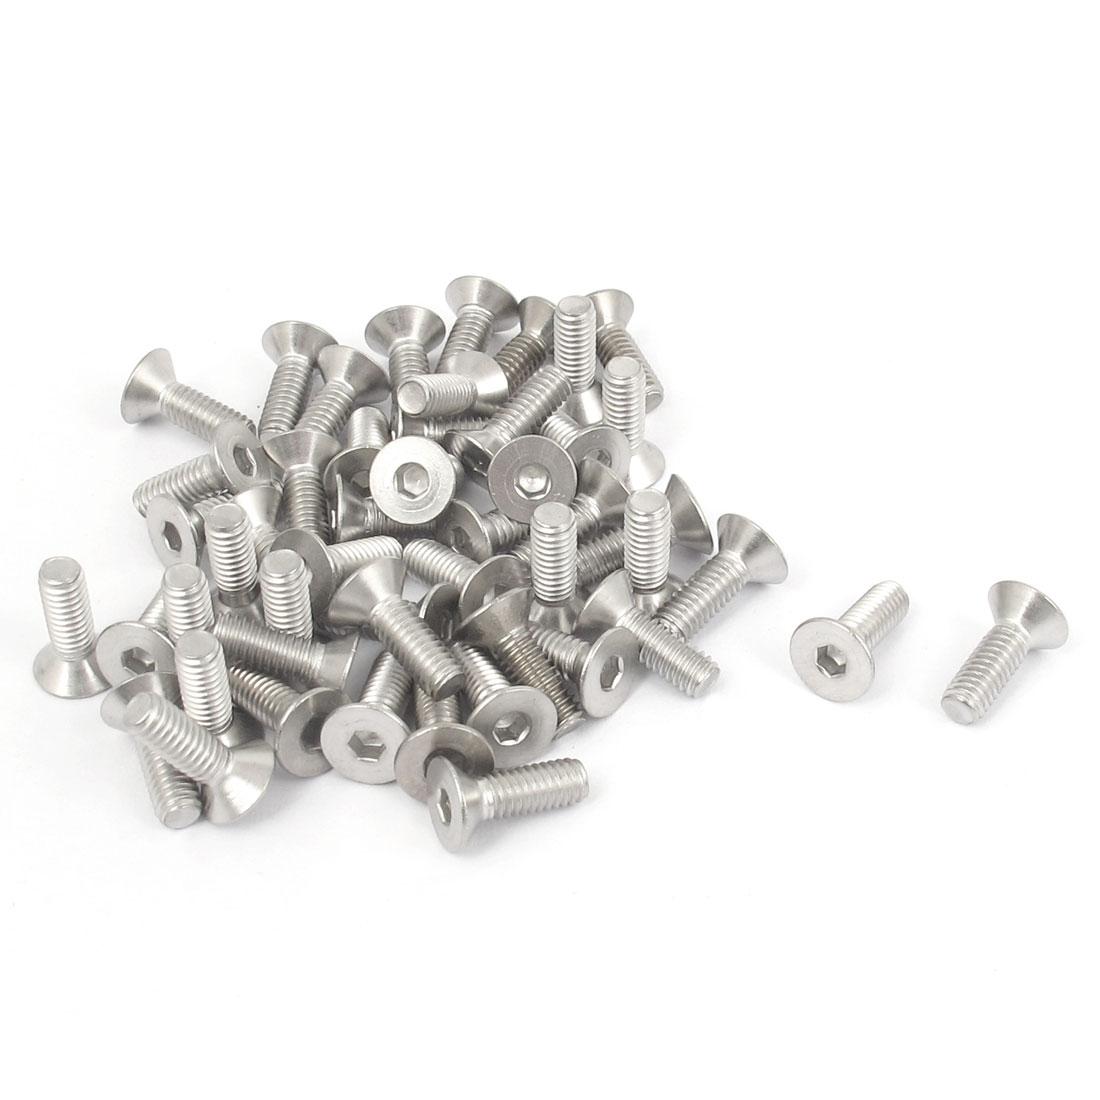 M4 x 12mm Metric 304 Stainless Steel Hex Socket Countersunk Flat Head Screw Bolts 50PCS